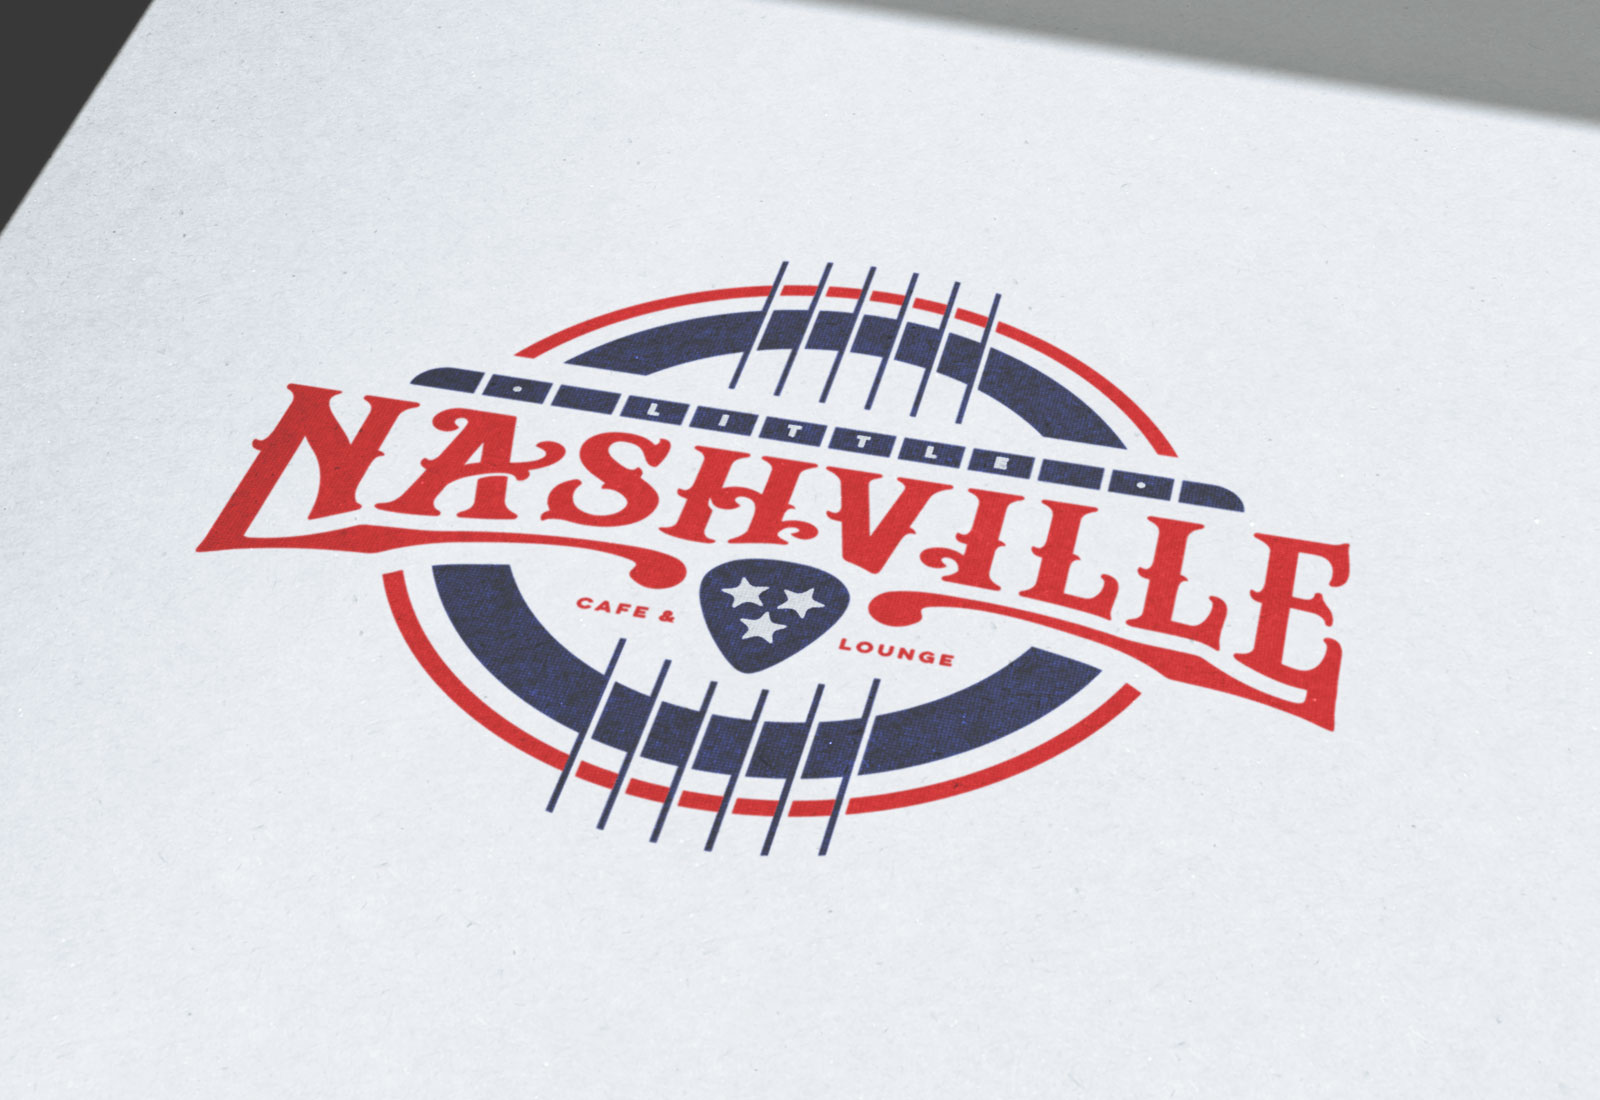 Little Nashvill Logo Design On Printed Paper